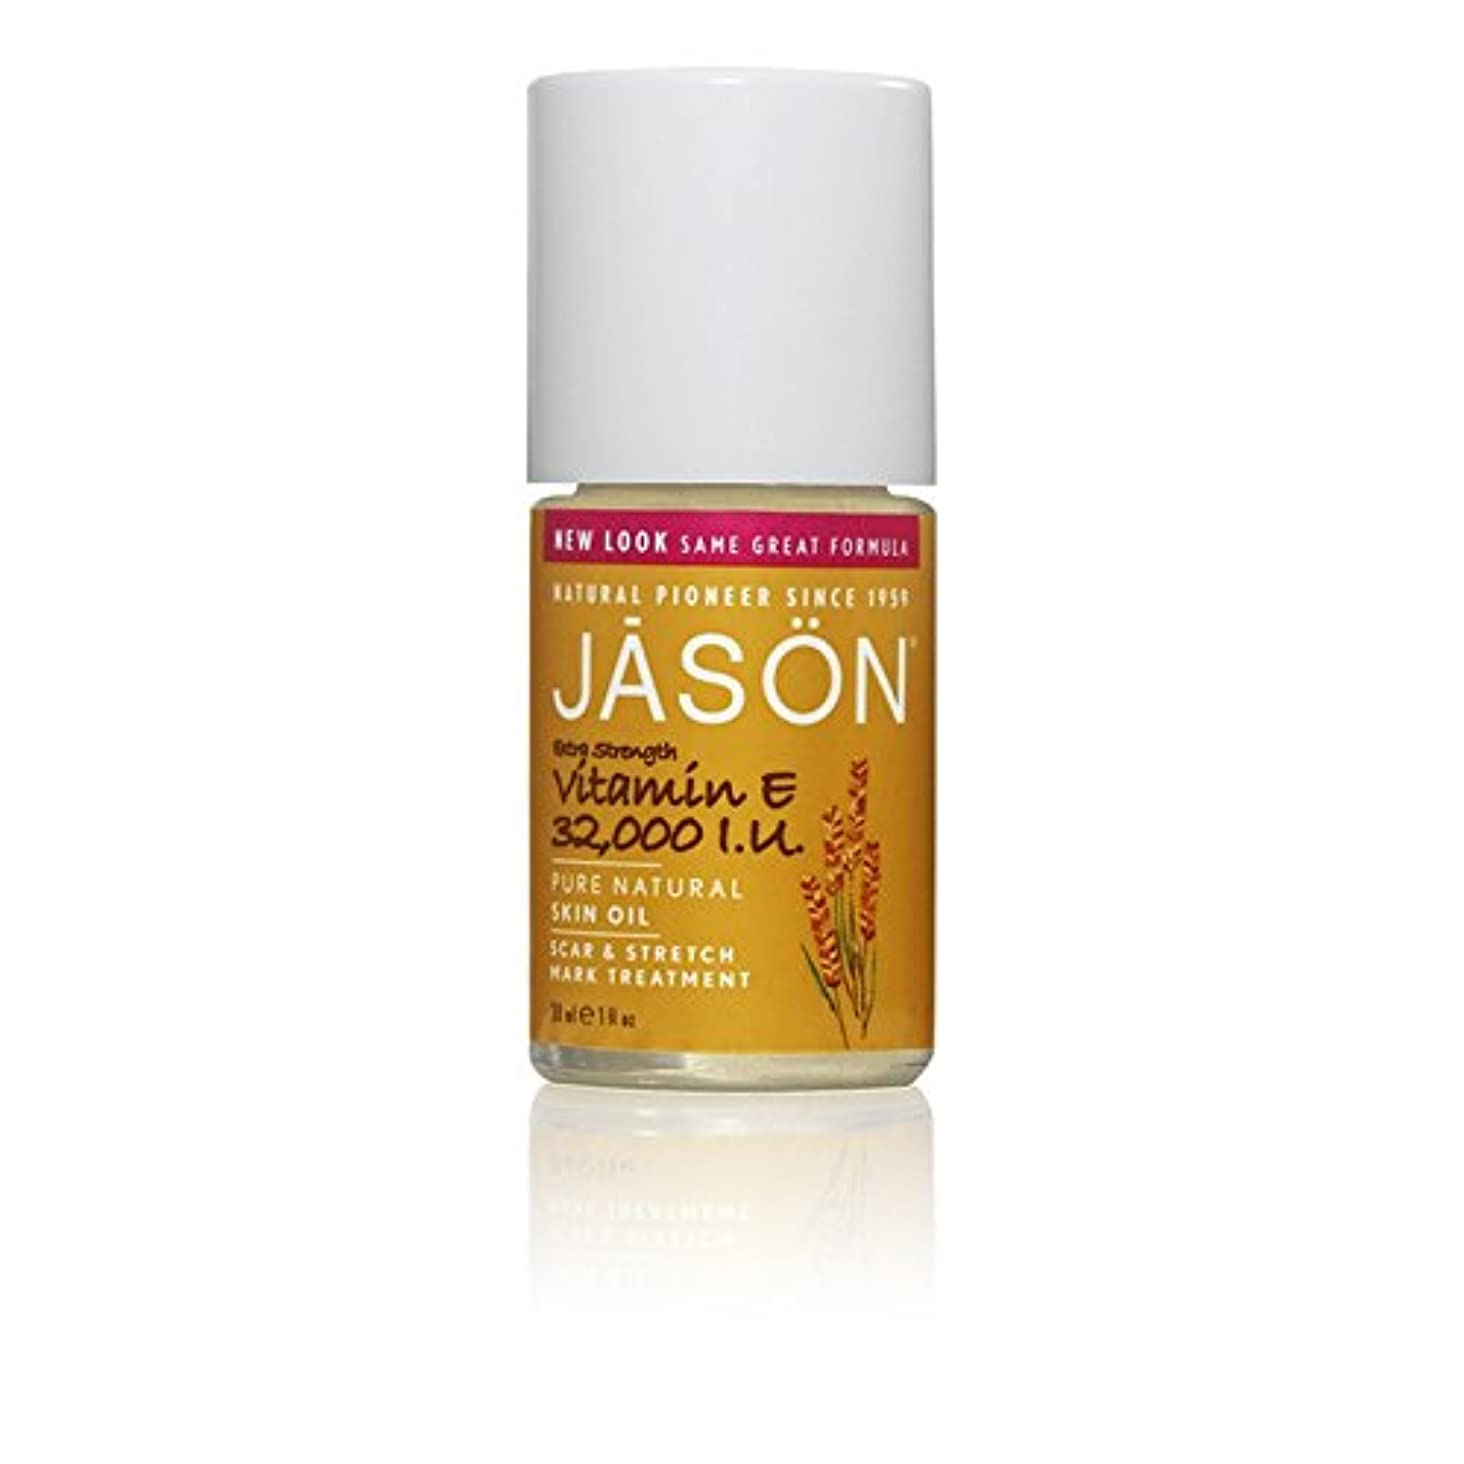 Jason Vitamin E 32,000iu Oil Scar & Stretch Mark Treatment 33ml (Pack of 6) - ジェイソン?ビタミン 32,000オイル傷跡&ストレッチマークトリートメント...